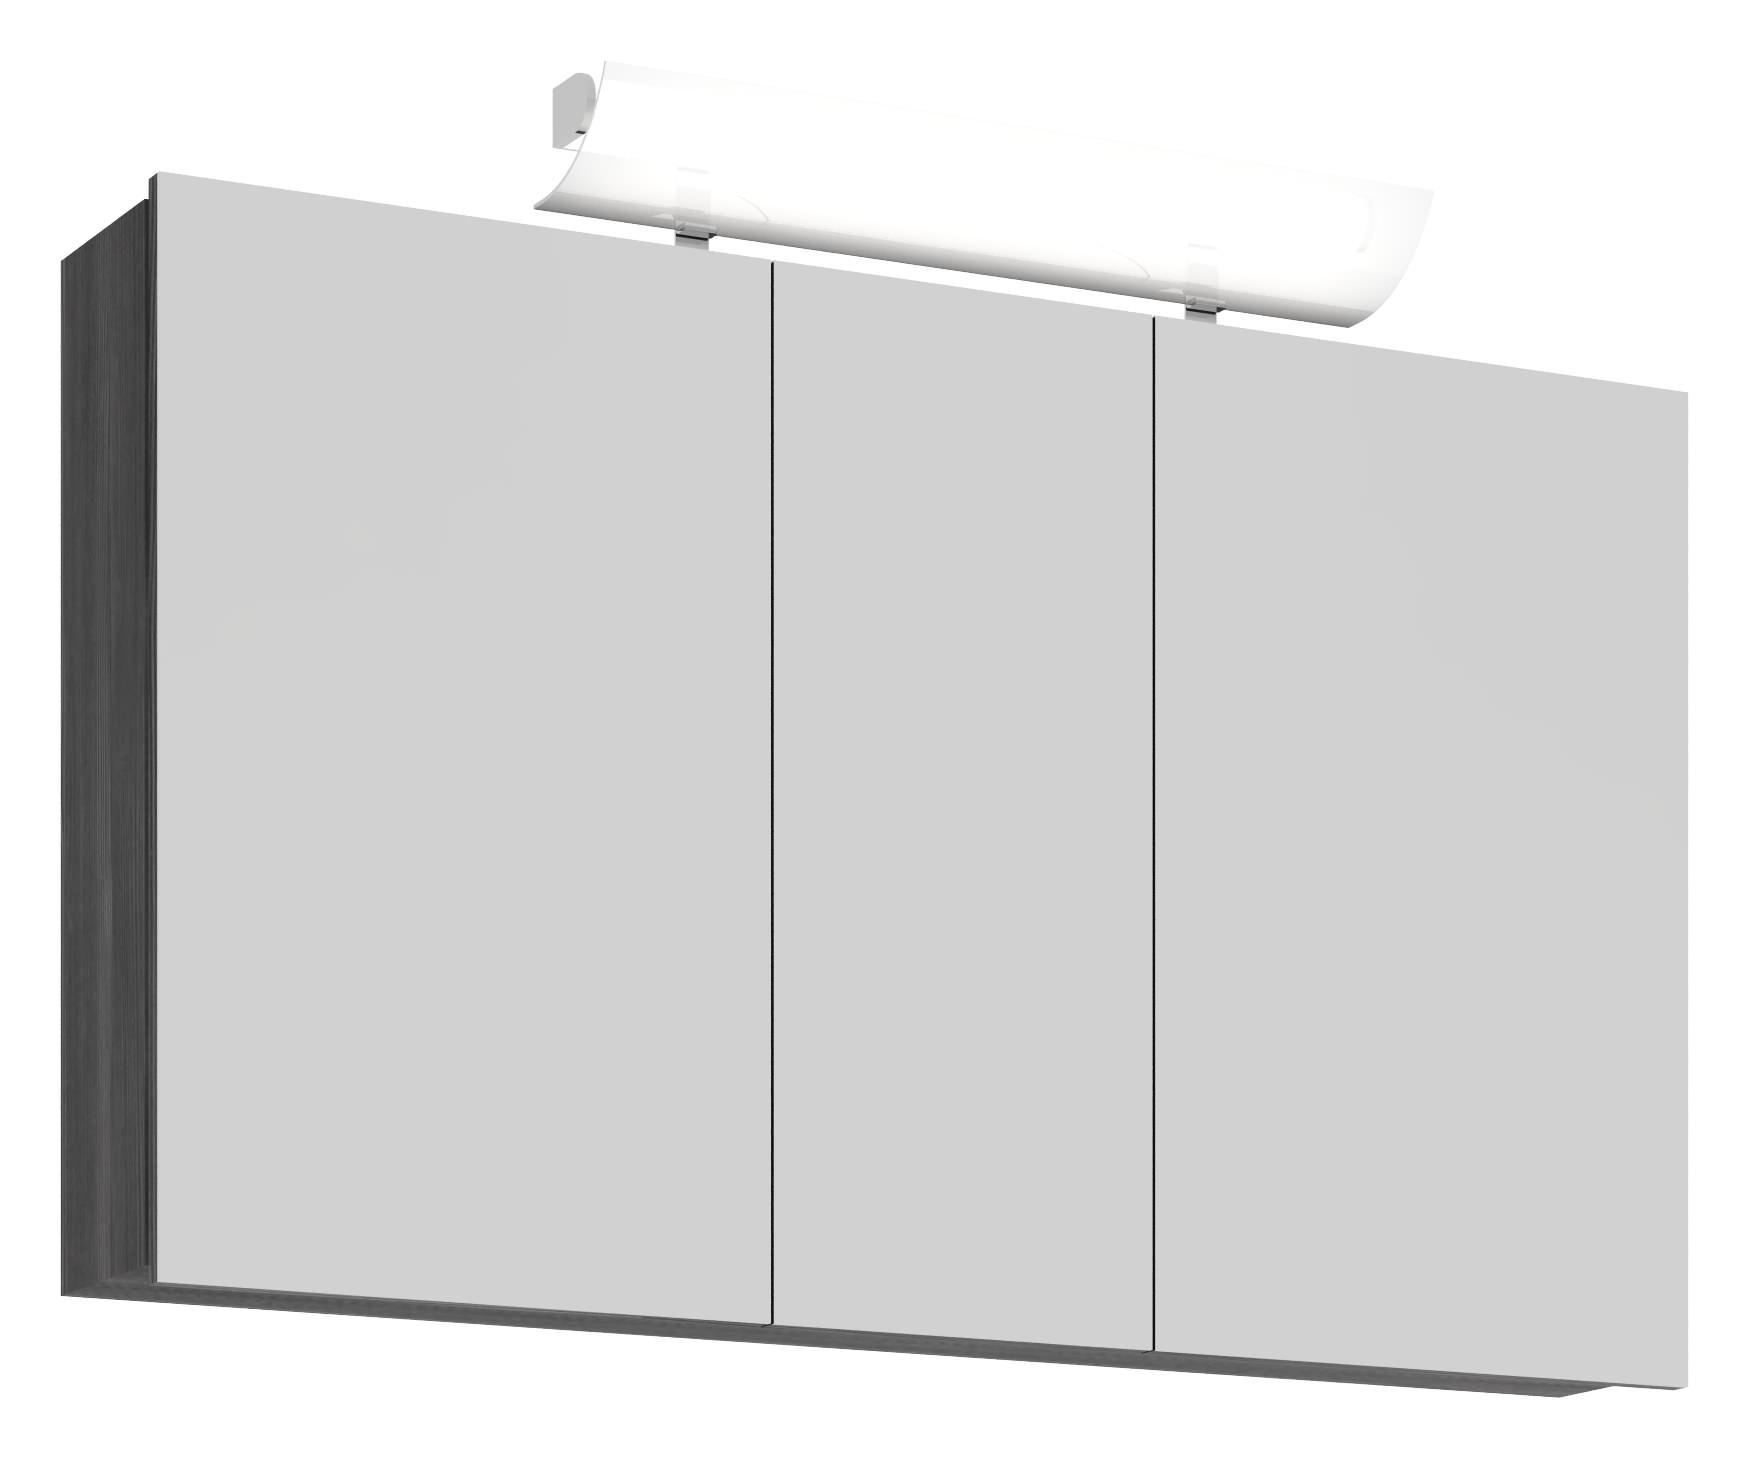 Scanbad rumba komplettset 120cm mit spiegelschrank pine grey ru 157734 - Scanbad spiegelschrank ...